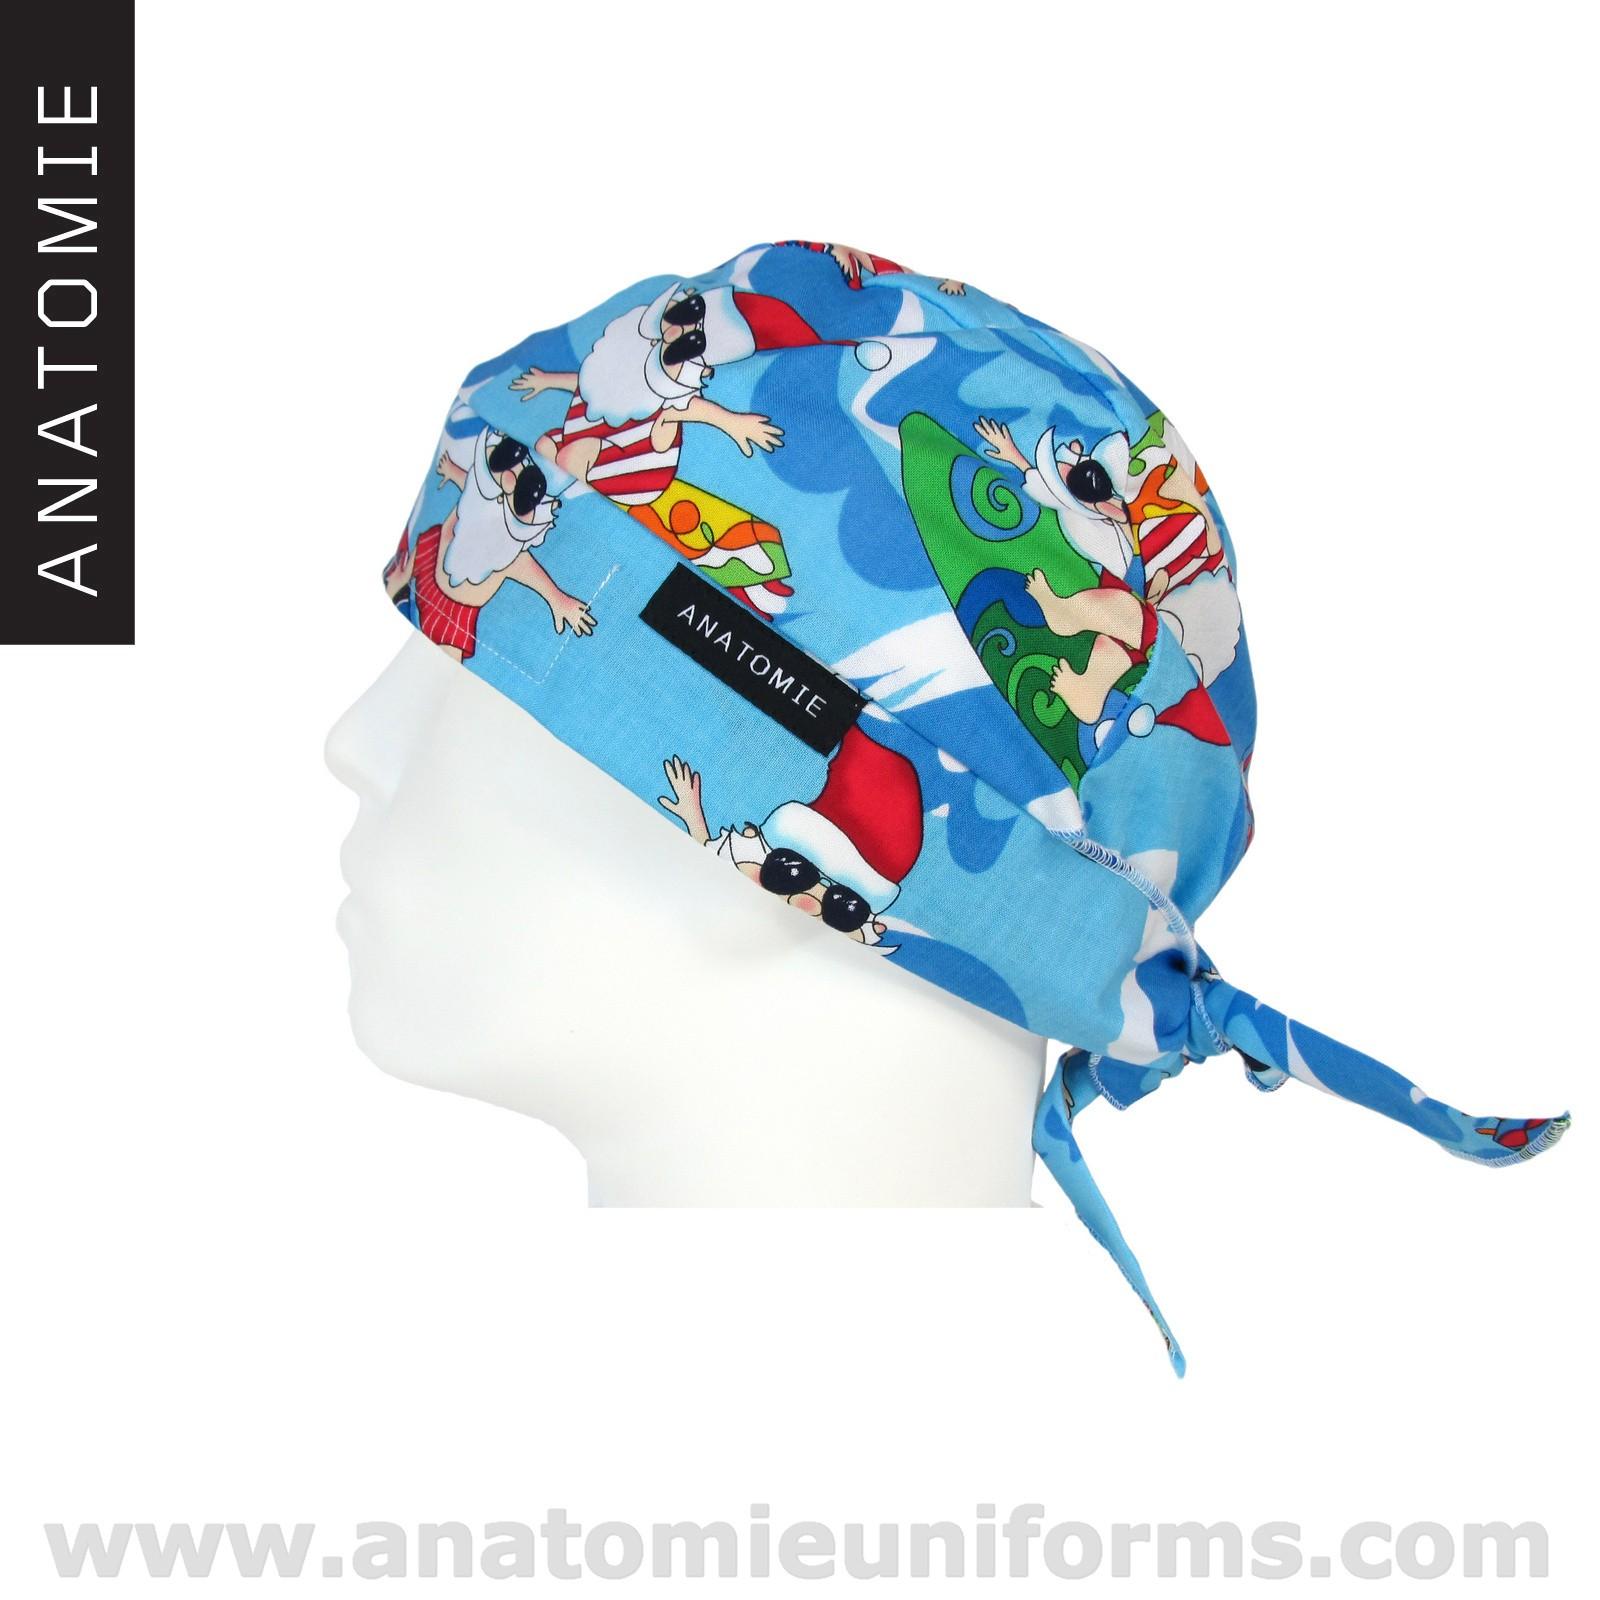 ANATOMIE BANDANA Chirurgien Santa Claus - 011